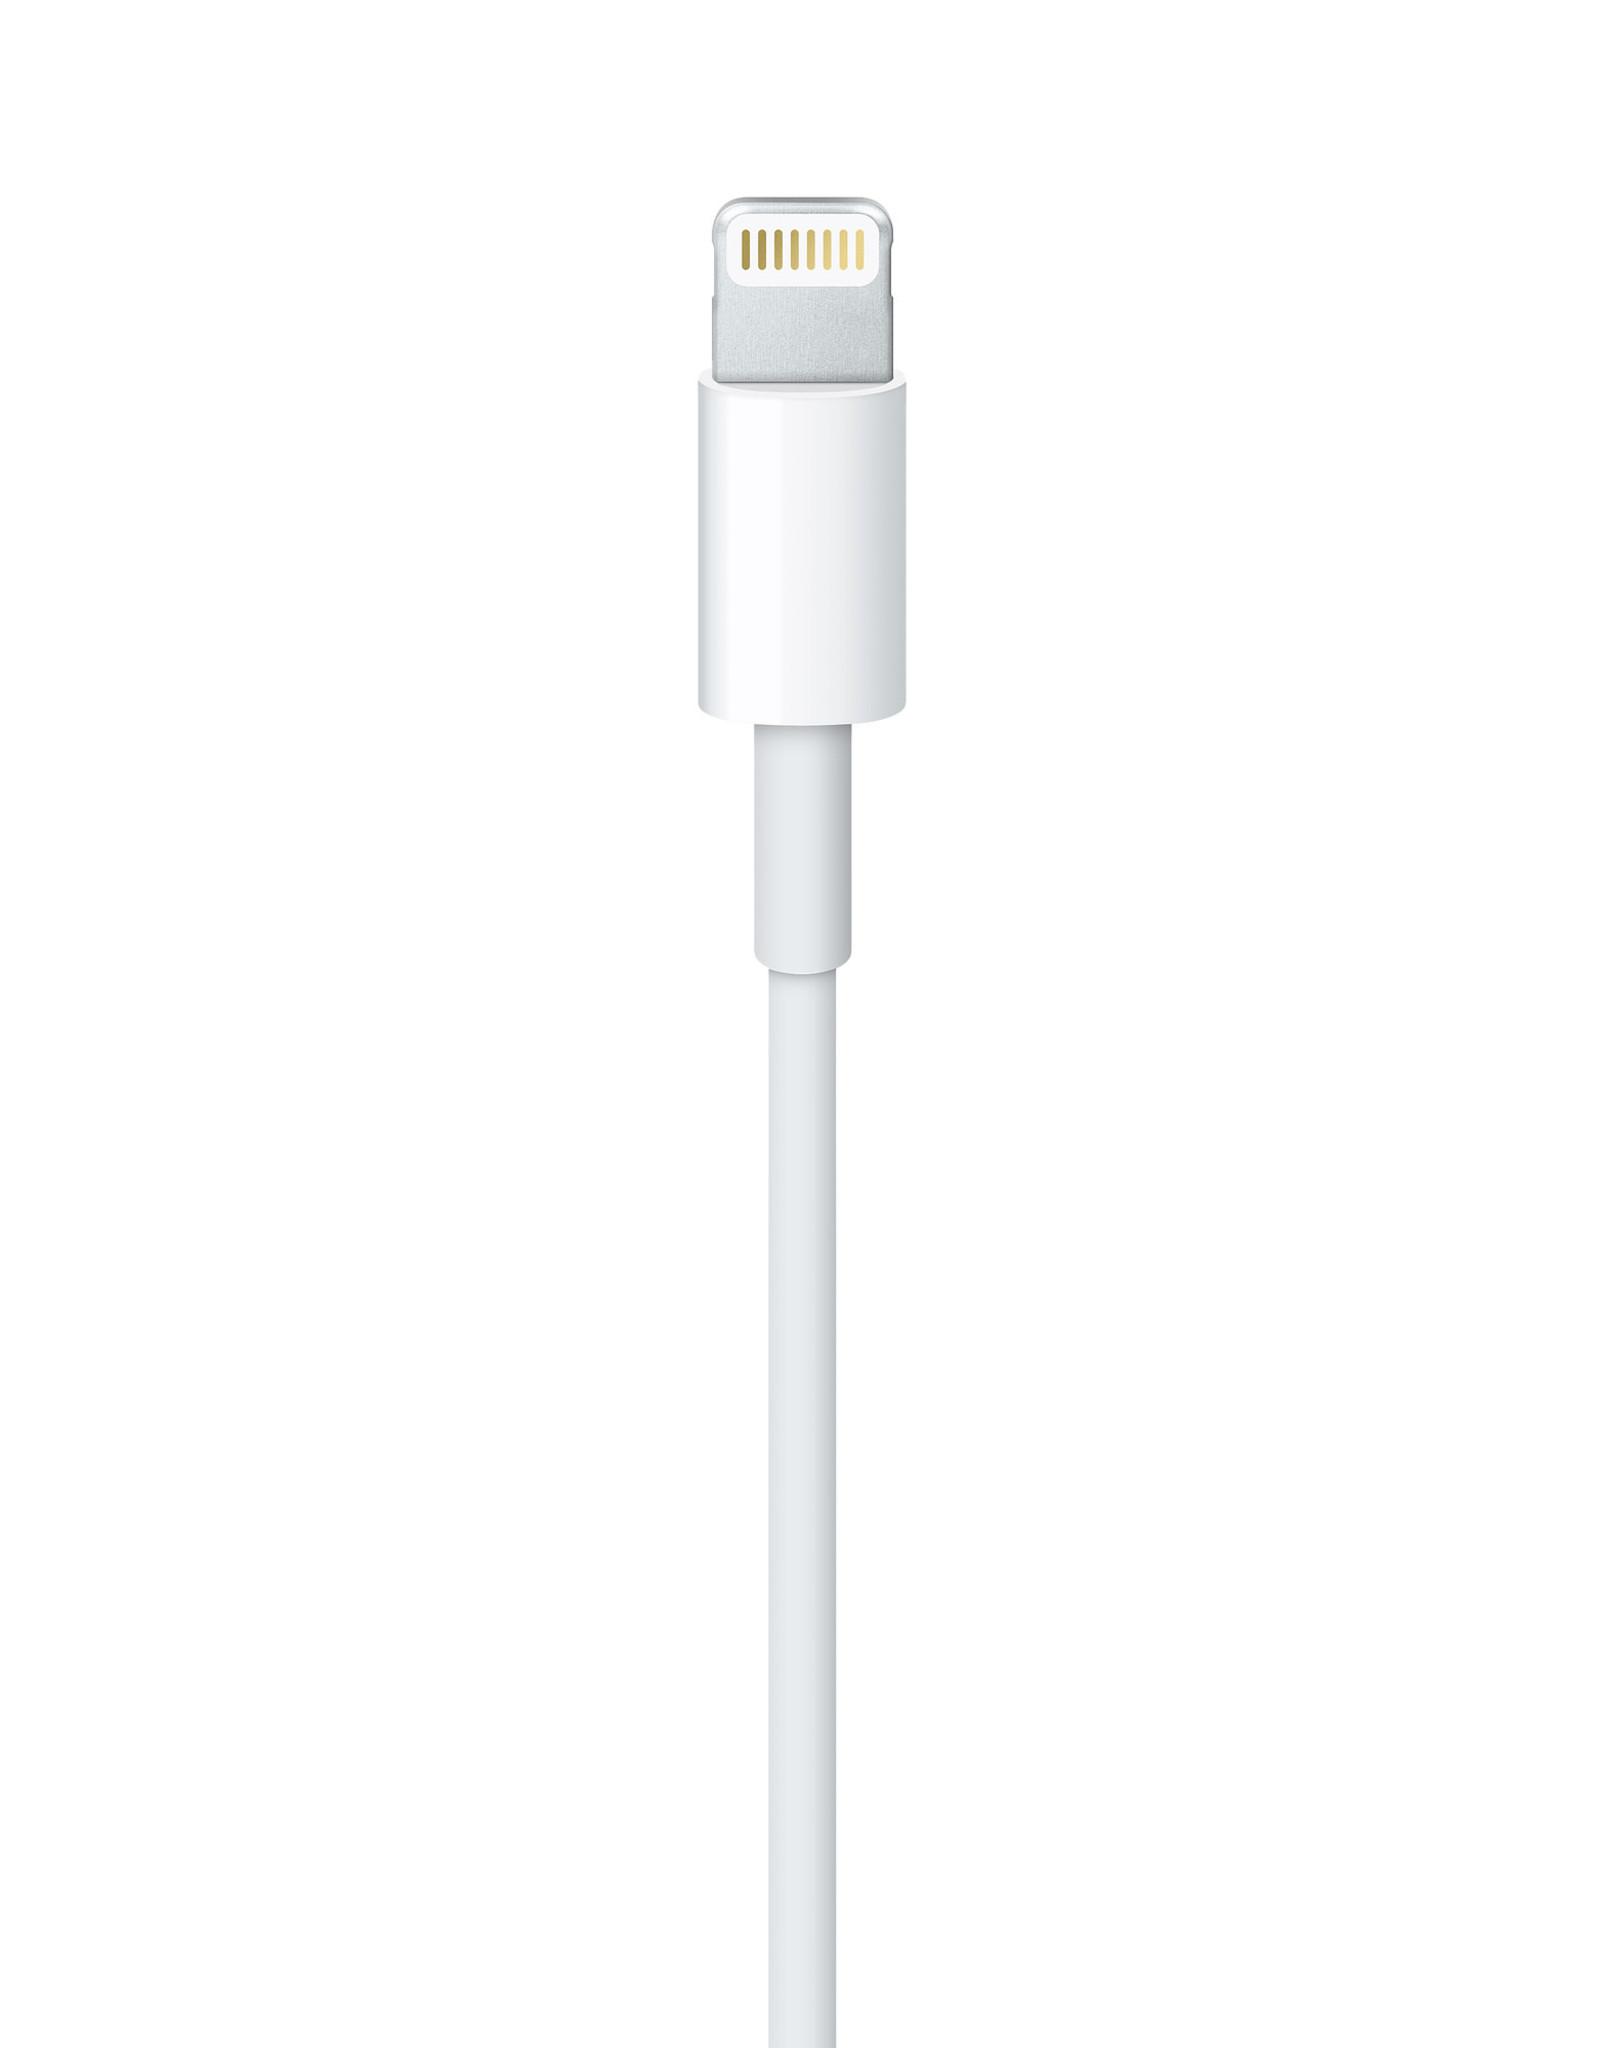 Apple Apple USB-C to Lightning Cable (1 m)